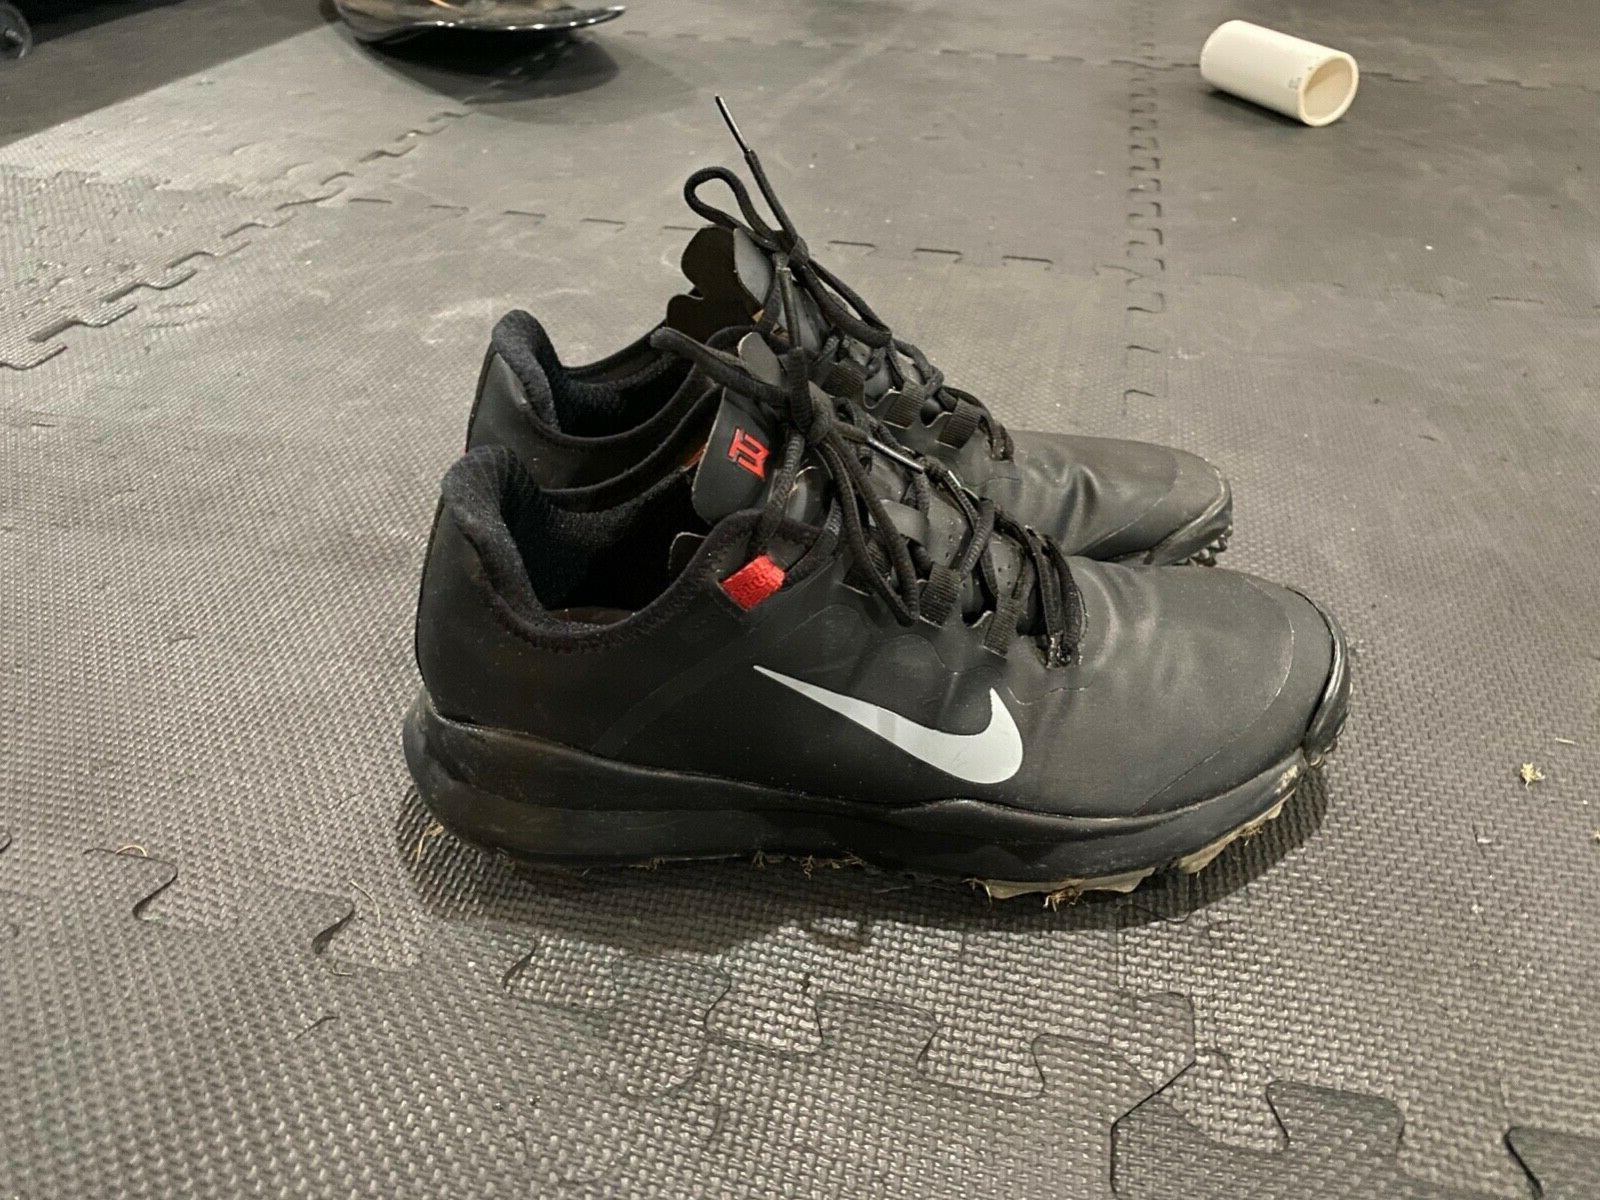 Nike, TW13, Black, Size 10.5